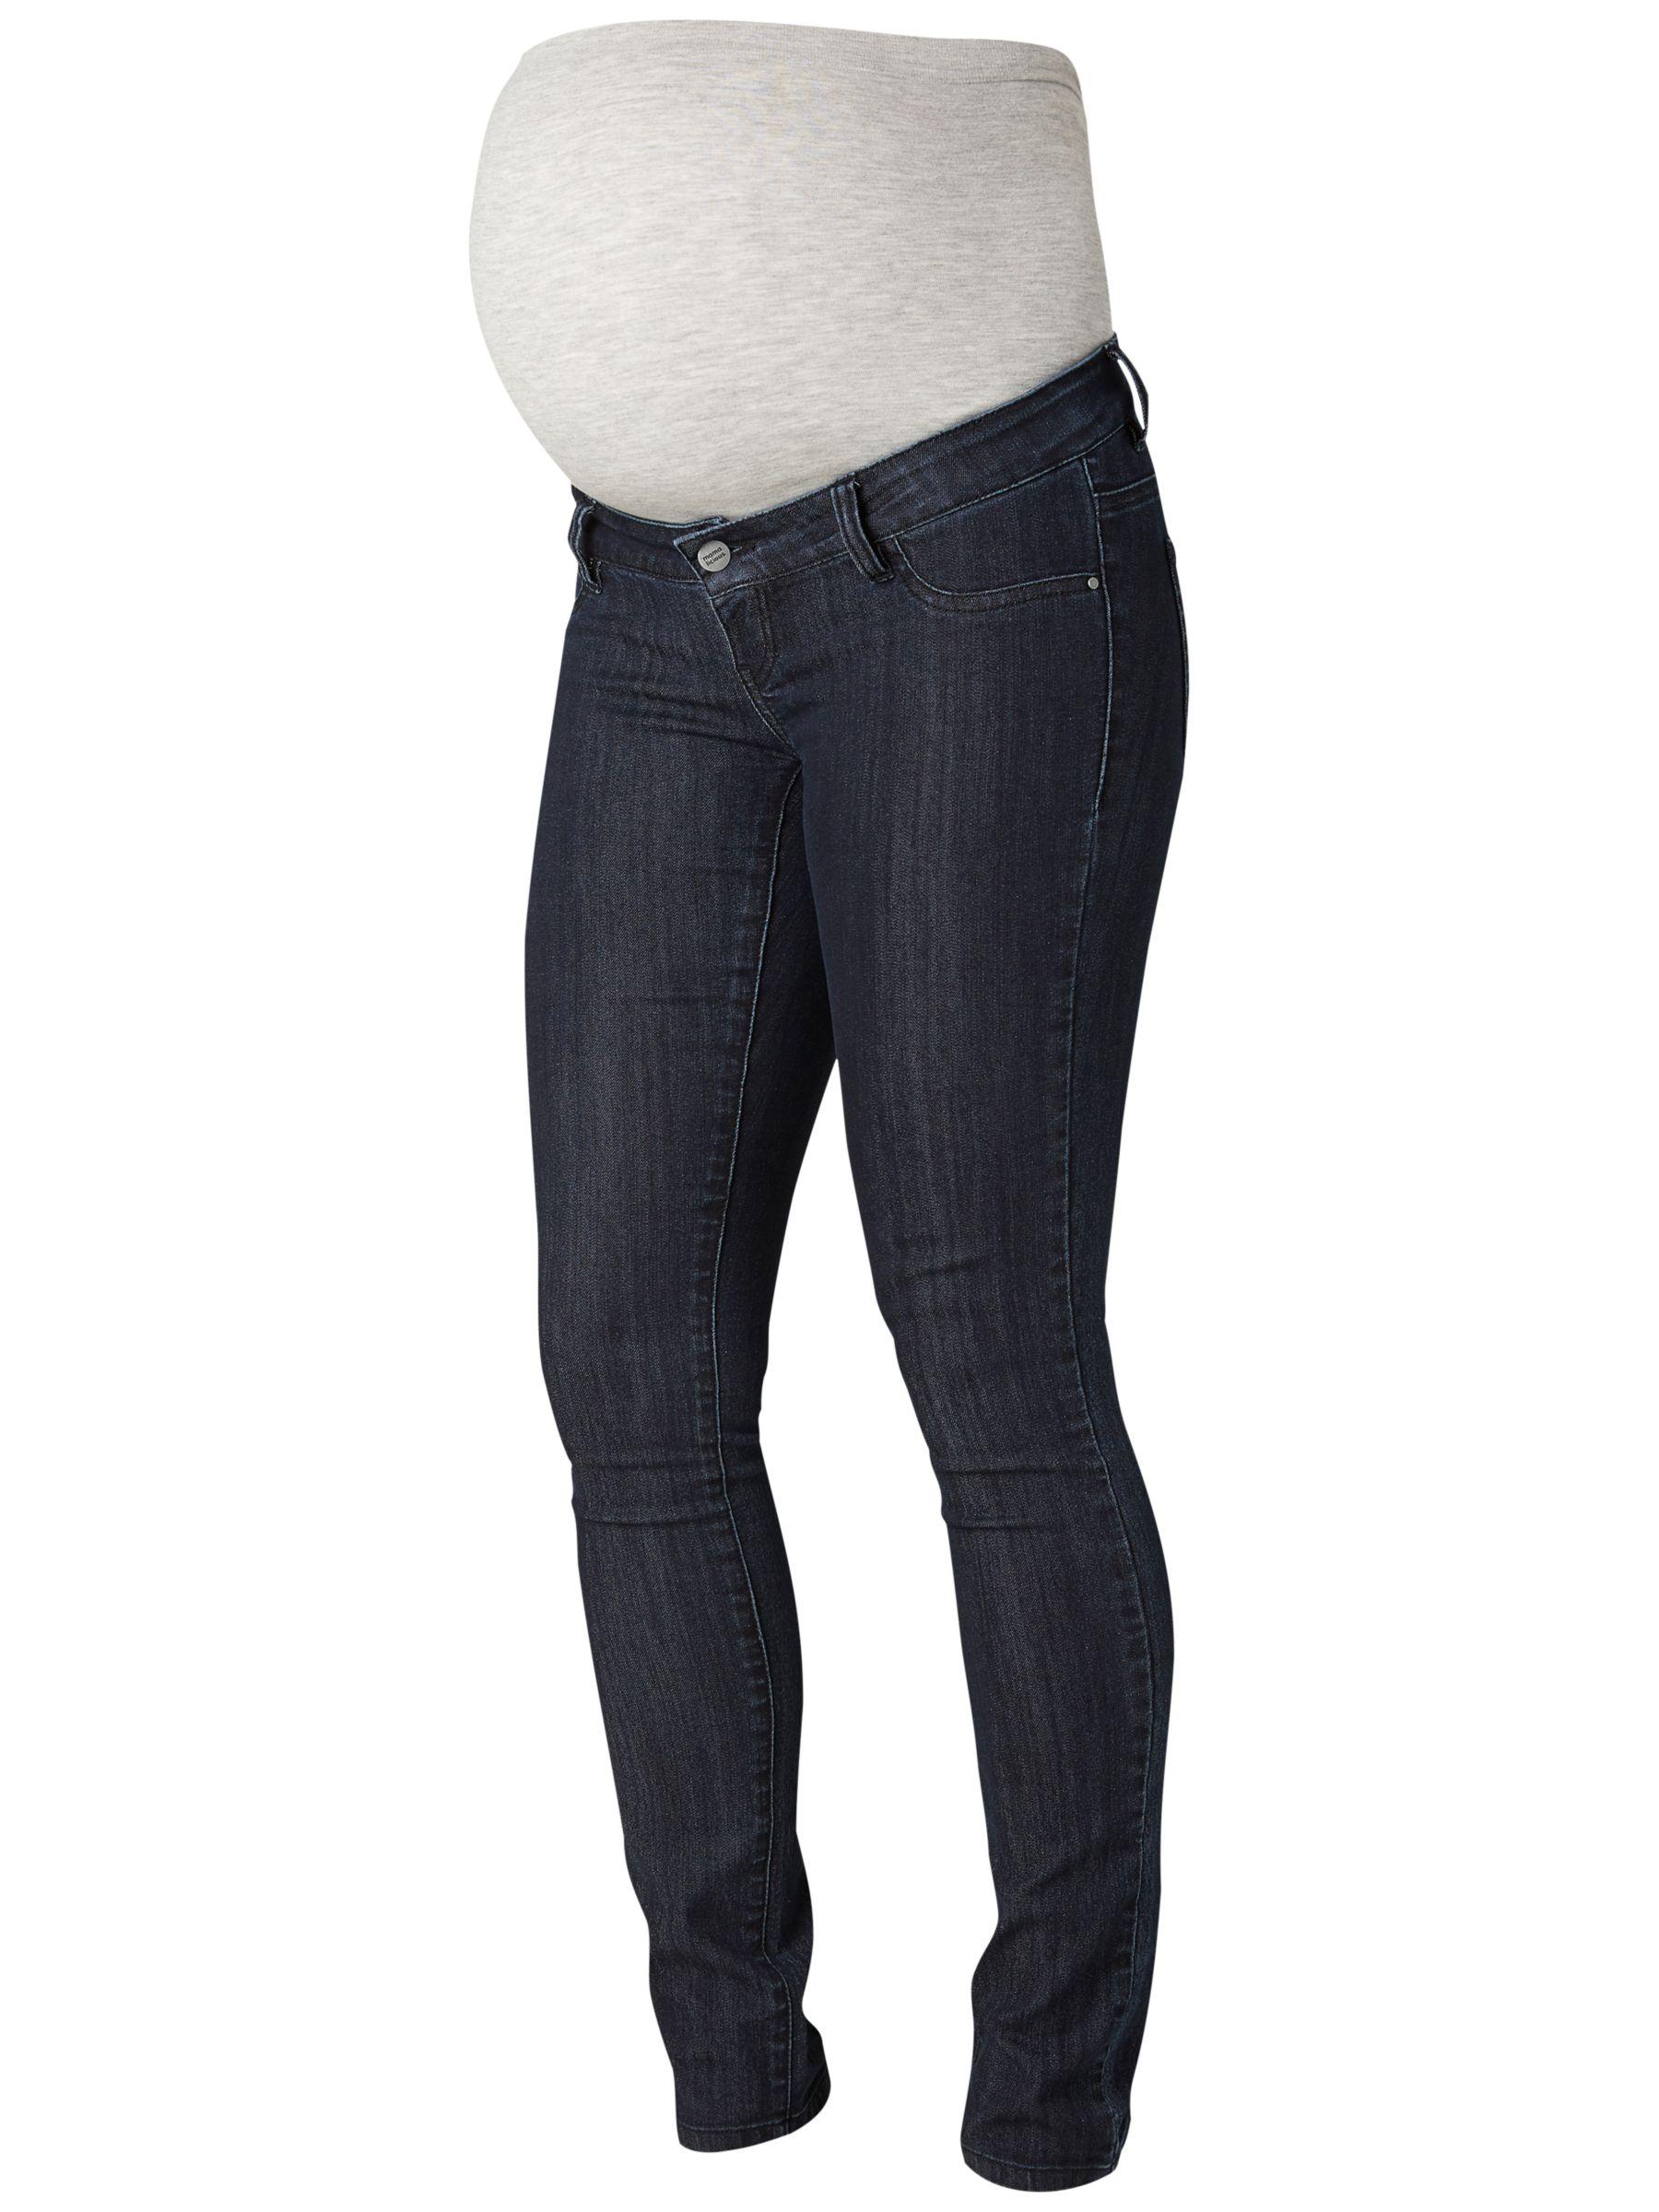 Mamalicious Mamalicious Julia Unwashed Slim Fit Maternity Jeans, Dark Blue